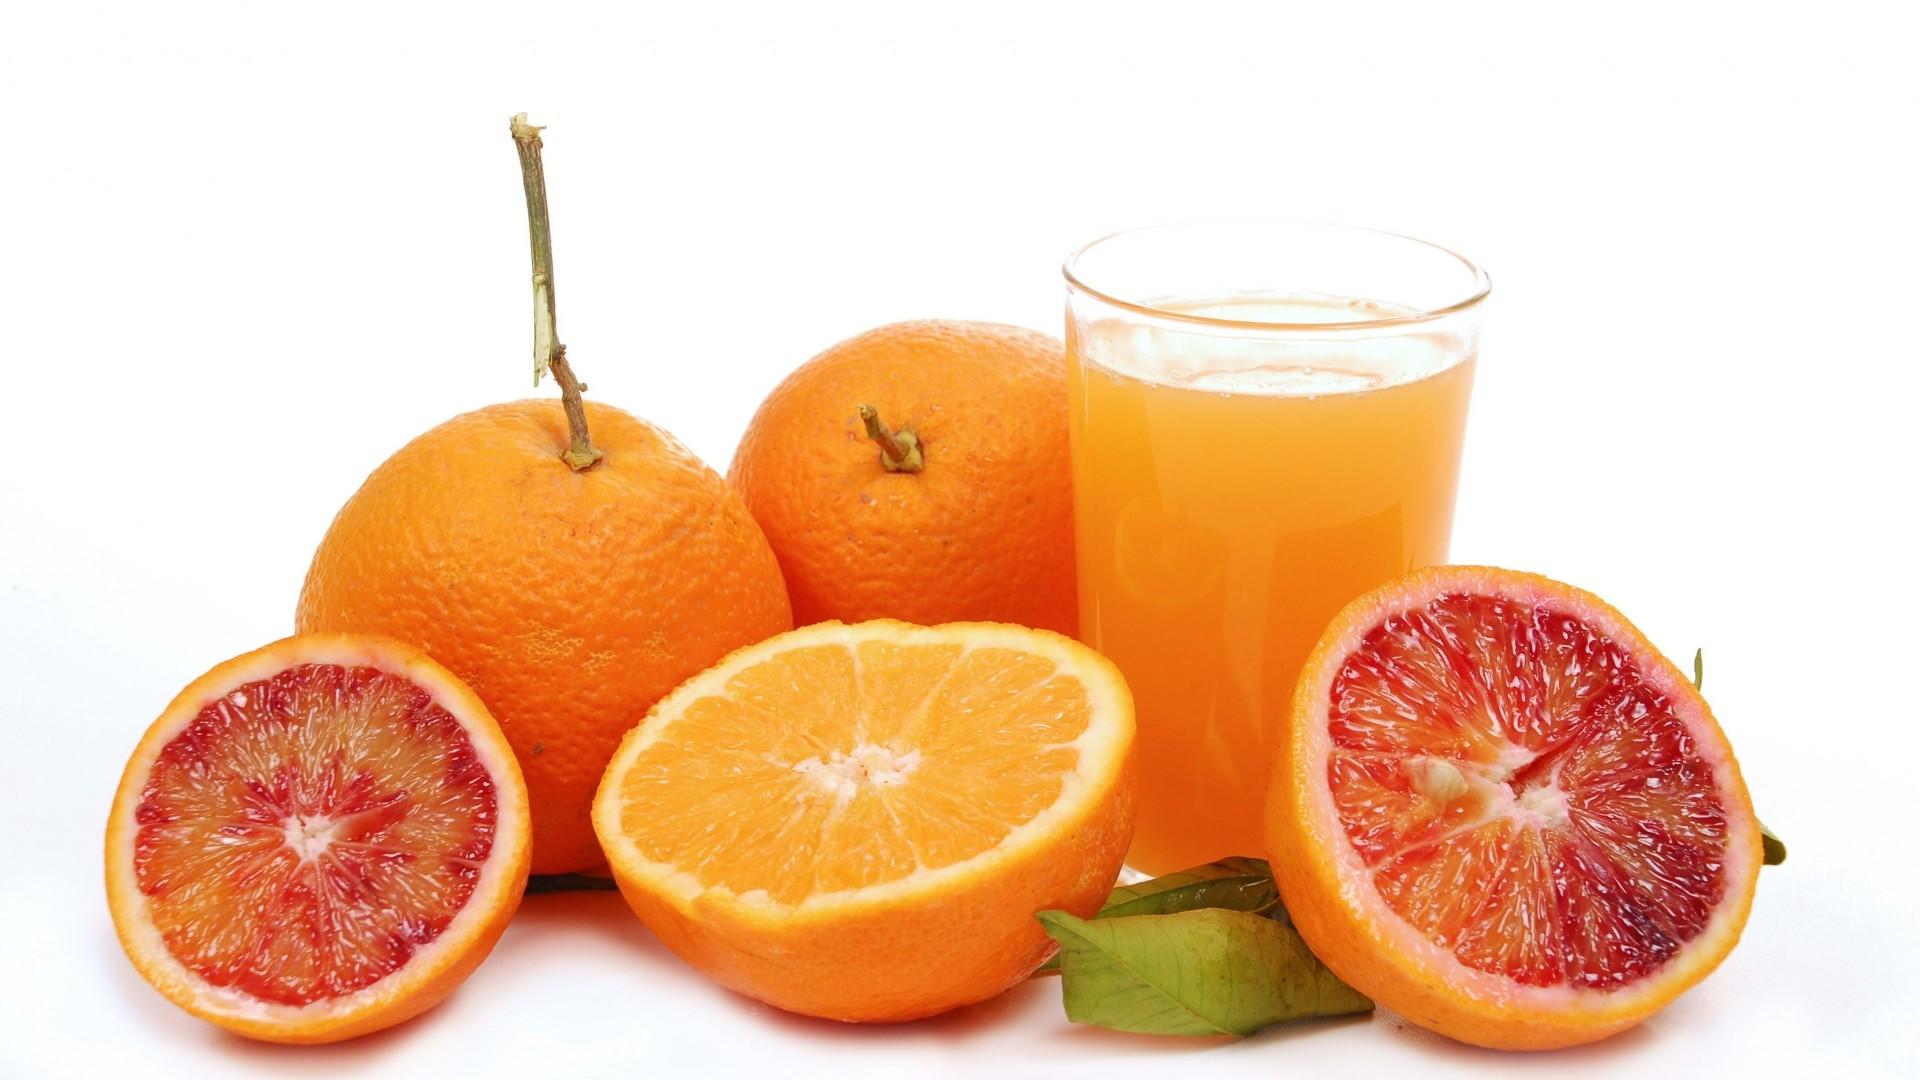 Wallpaper grapefruit, orange, juice, glass, white background